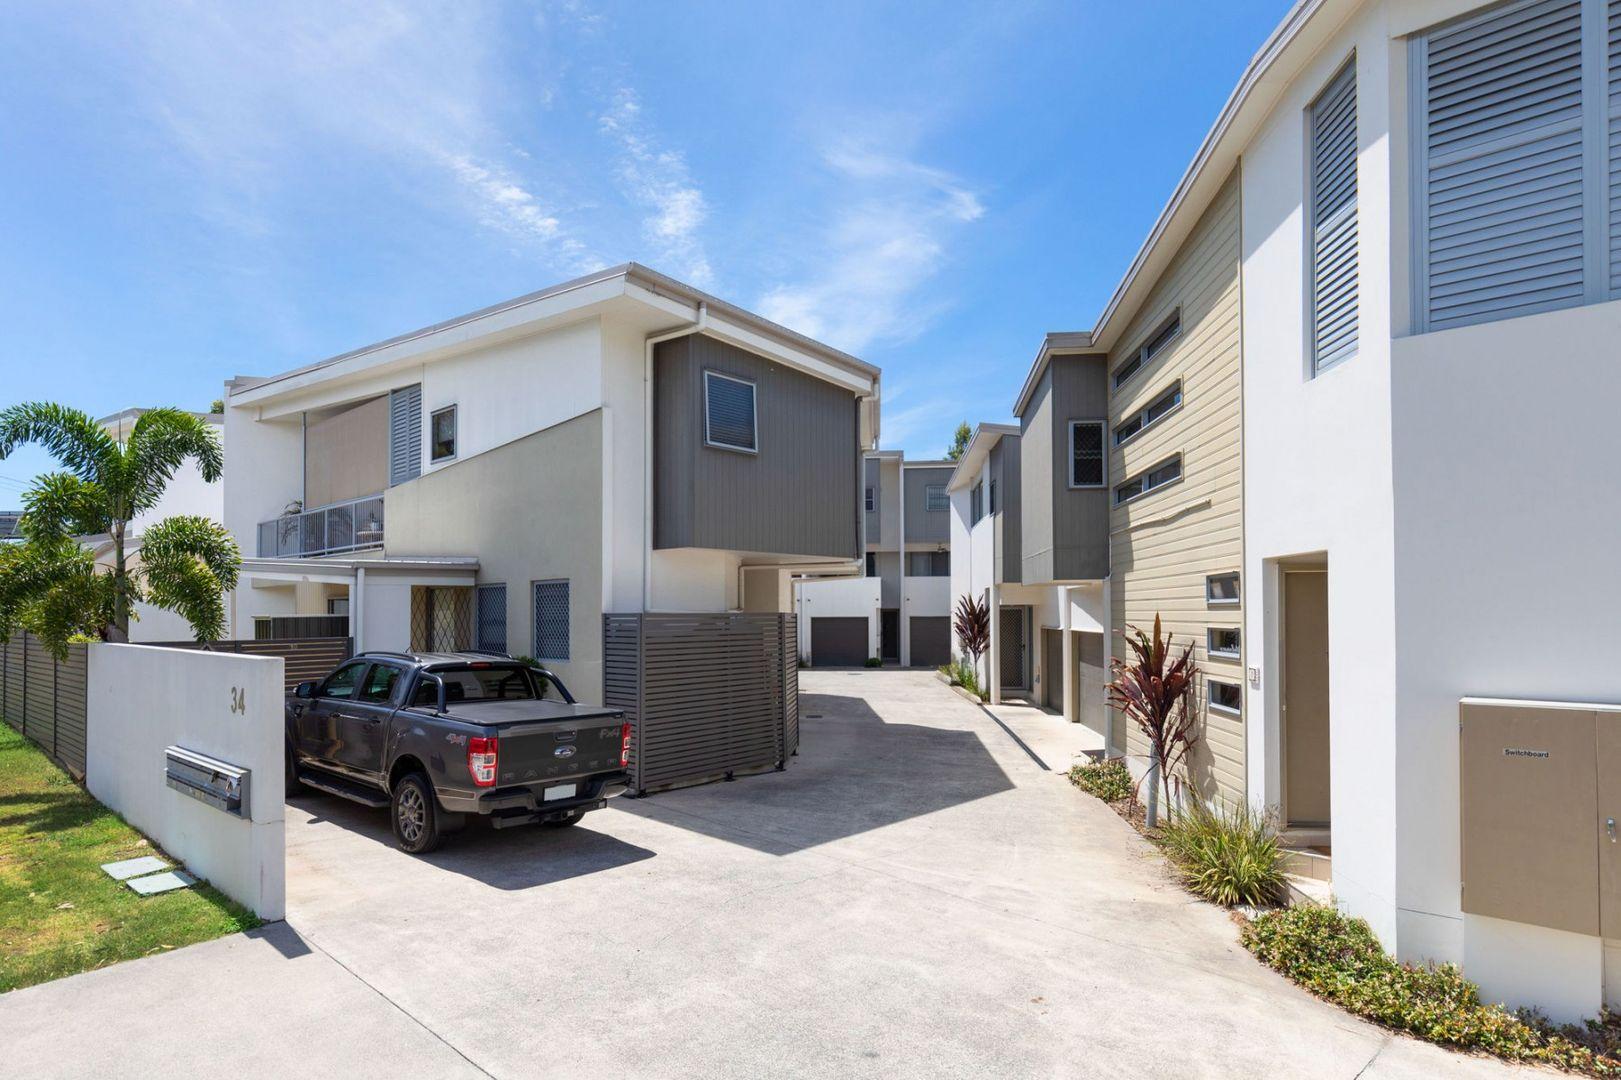 5/34 Bridgewater Street, Morningside QLD 4170, Image 1